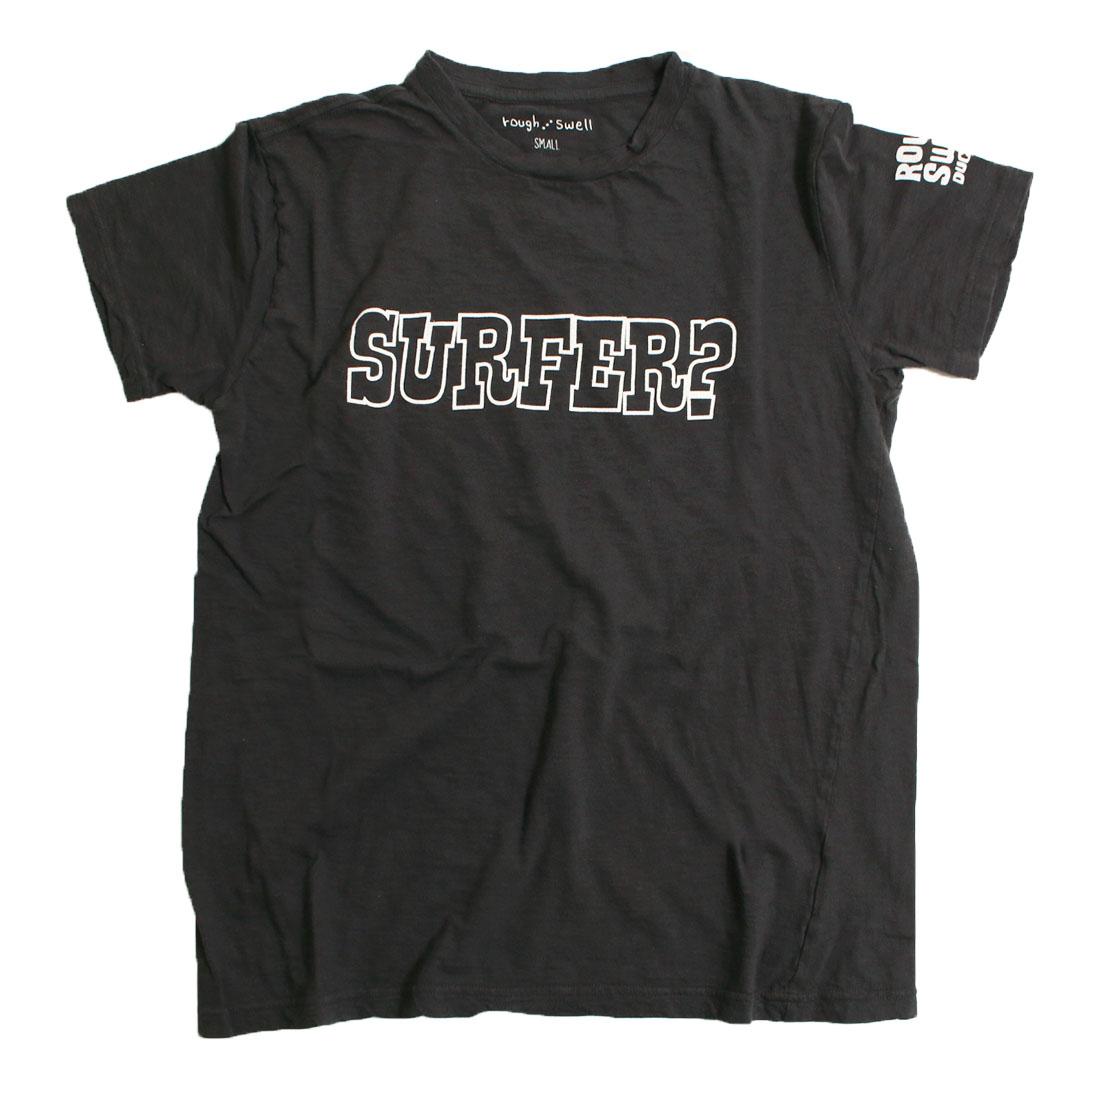 rough&swell ラフ&スウェル  メンズ【送料無料】 SURFER? TEE(S M L XL)半袖Tシャツ